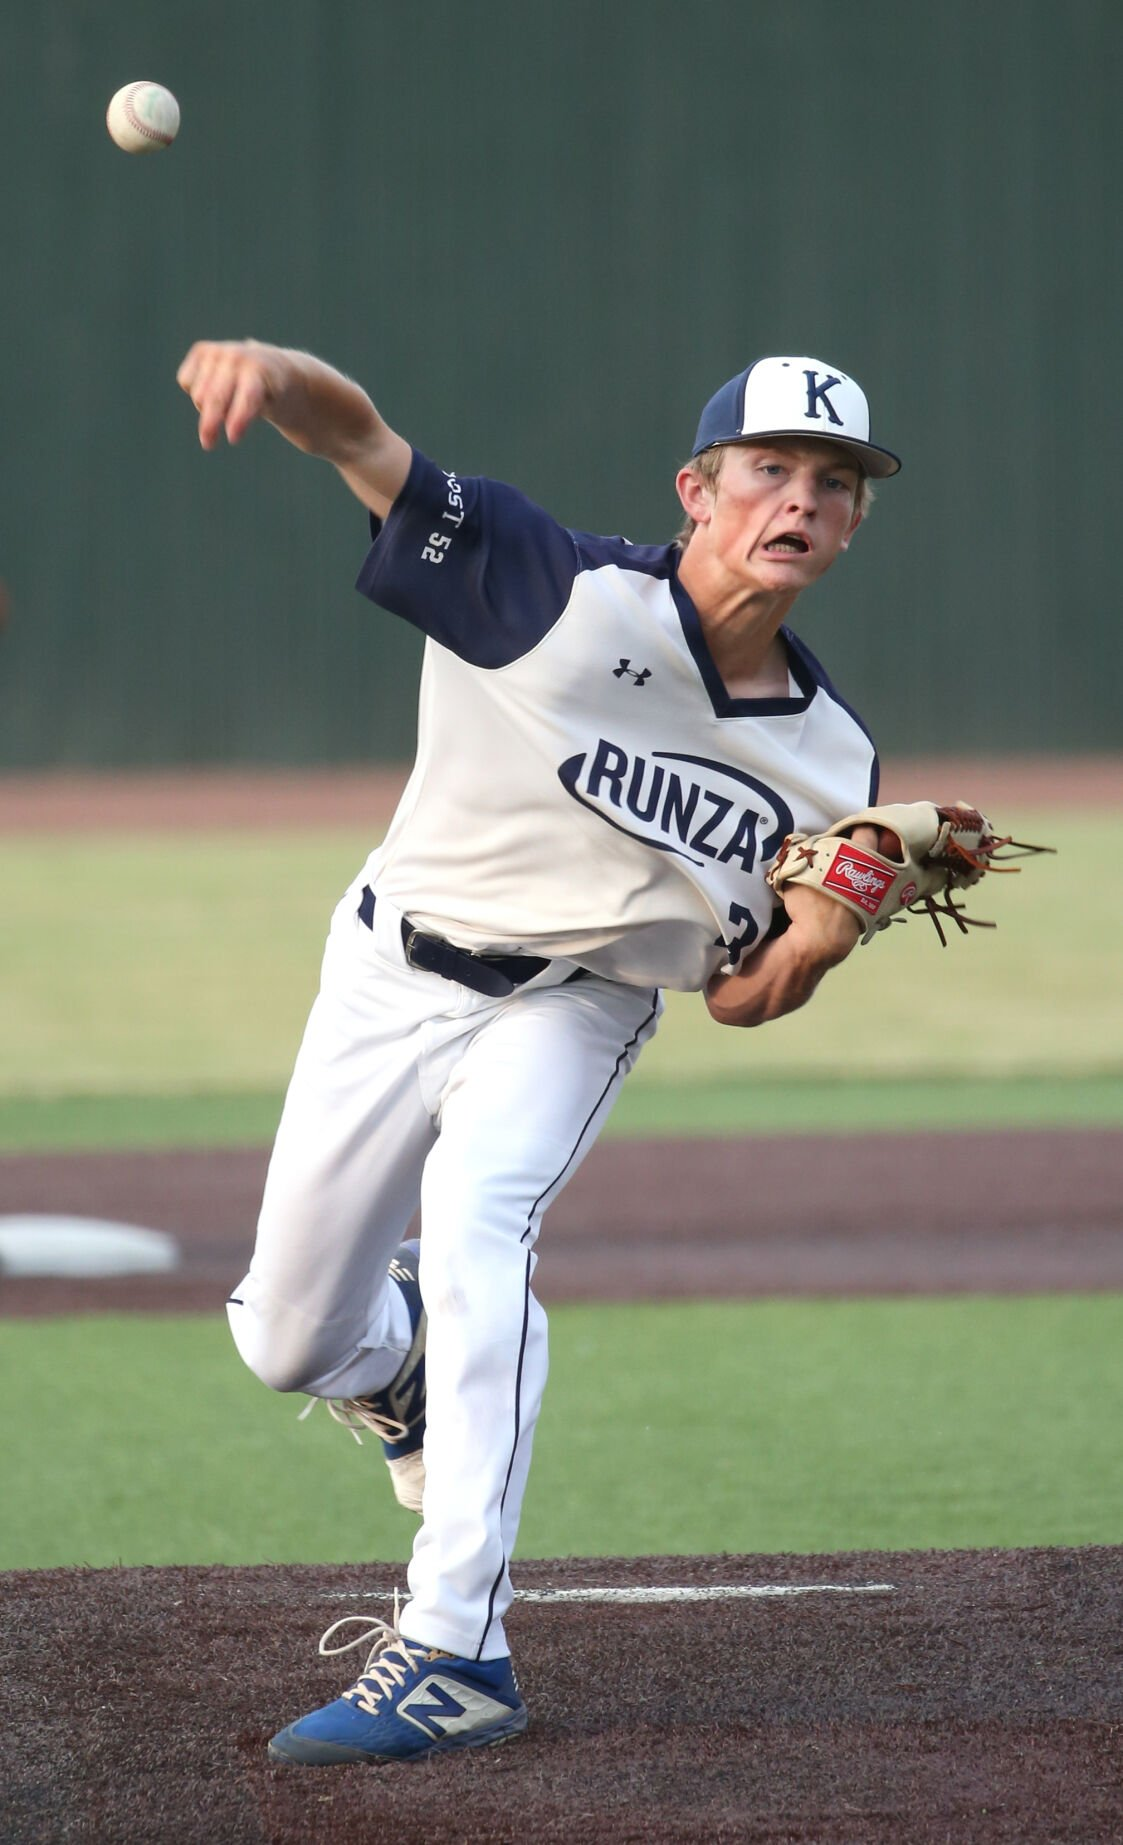 Lucas Wegner pitching